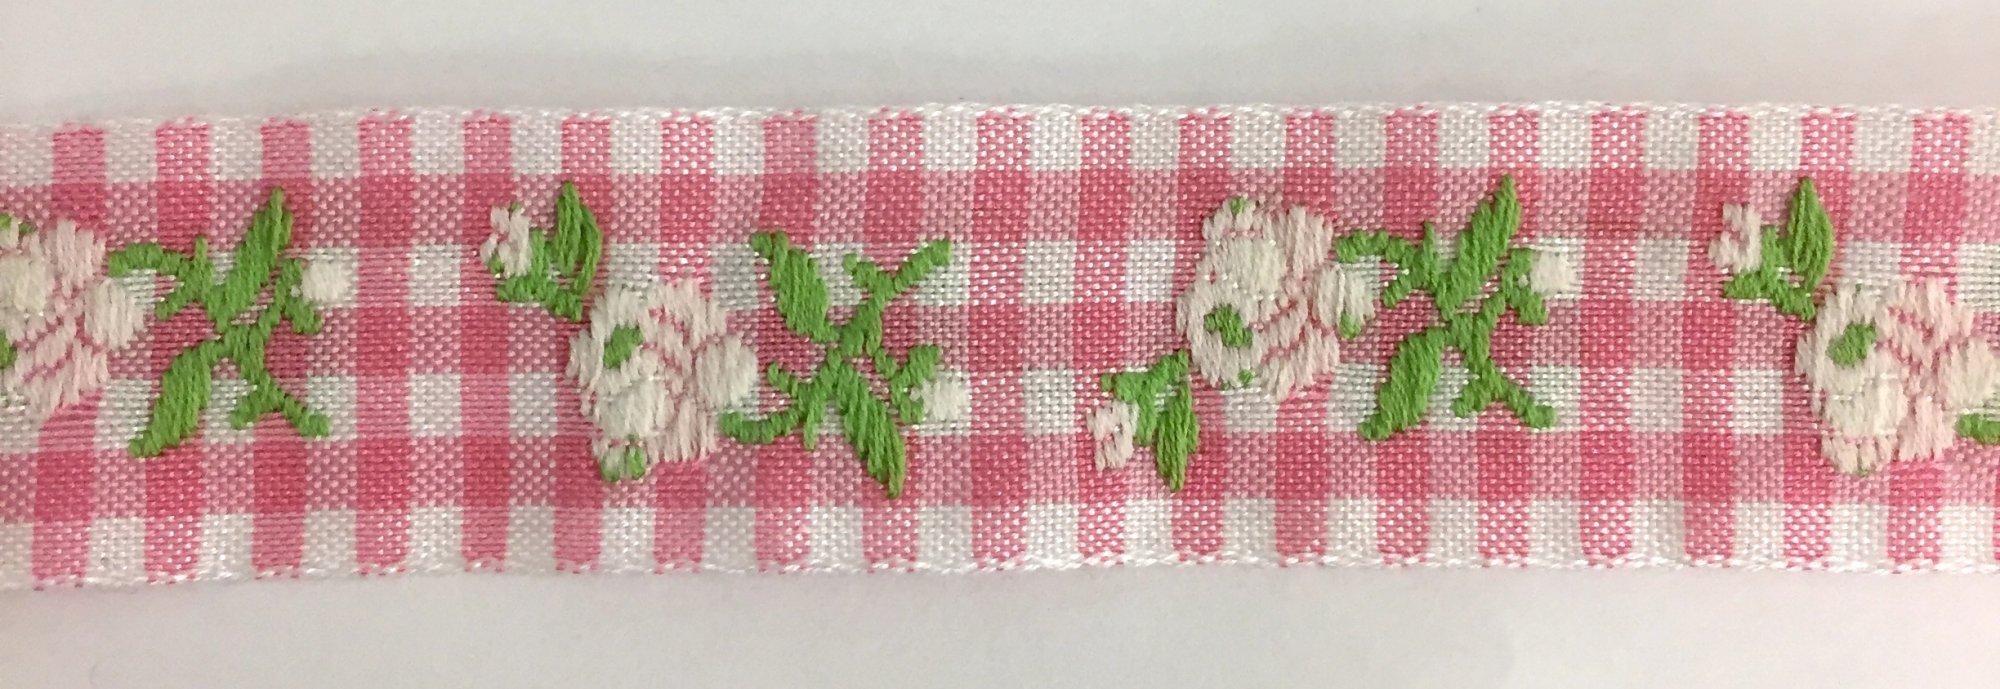 7/8 inch- Pink Gingham White Flower